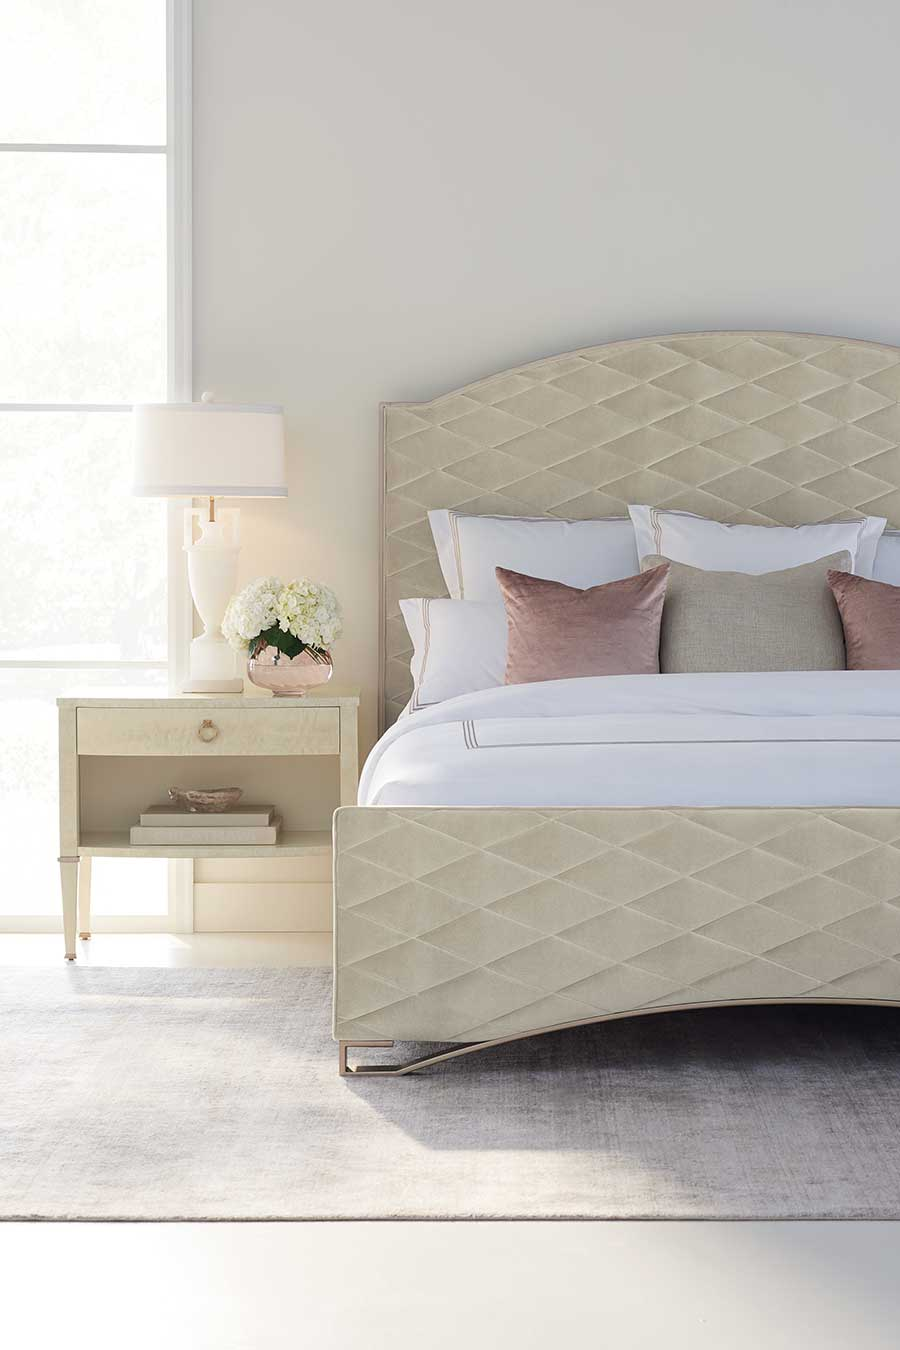 Bedroom | Contemporary Luxury Designer Modern Exclusive Handcrafted Furniture | Sandton Johannesburg